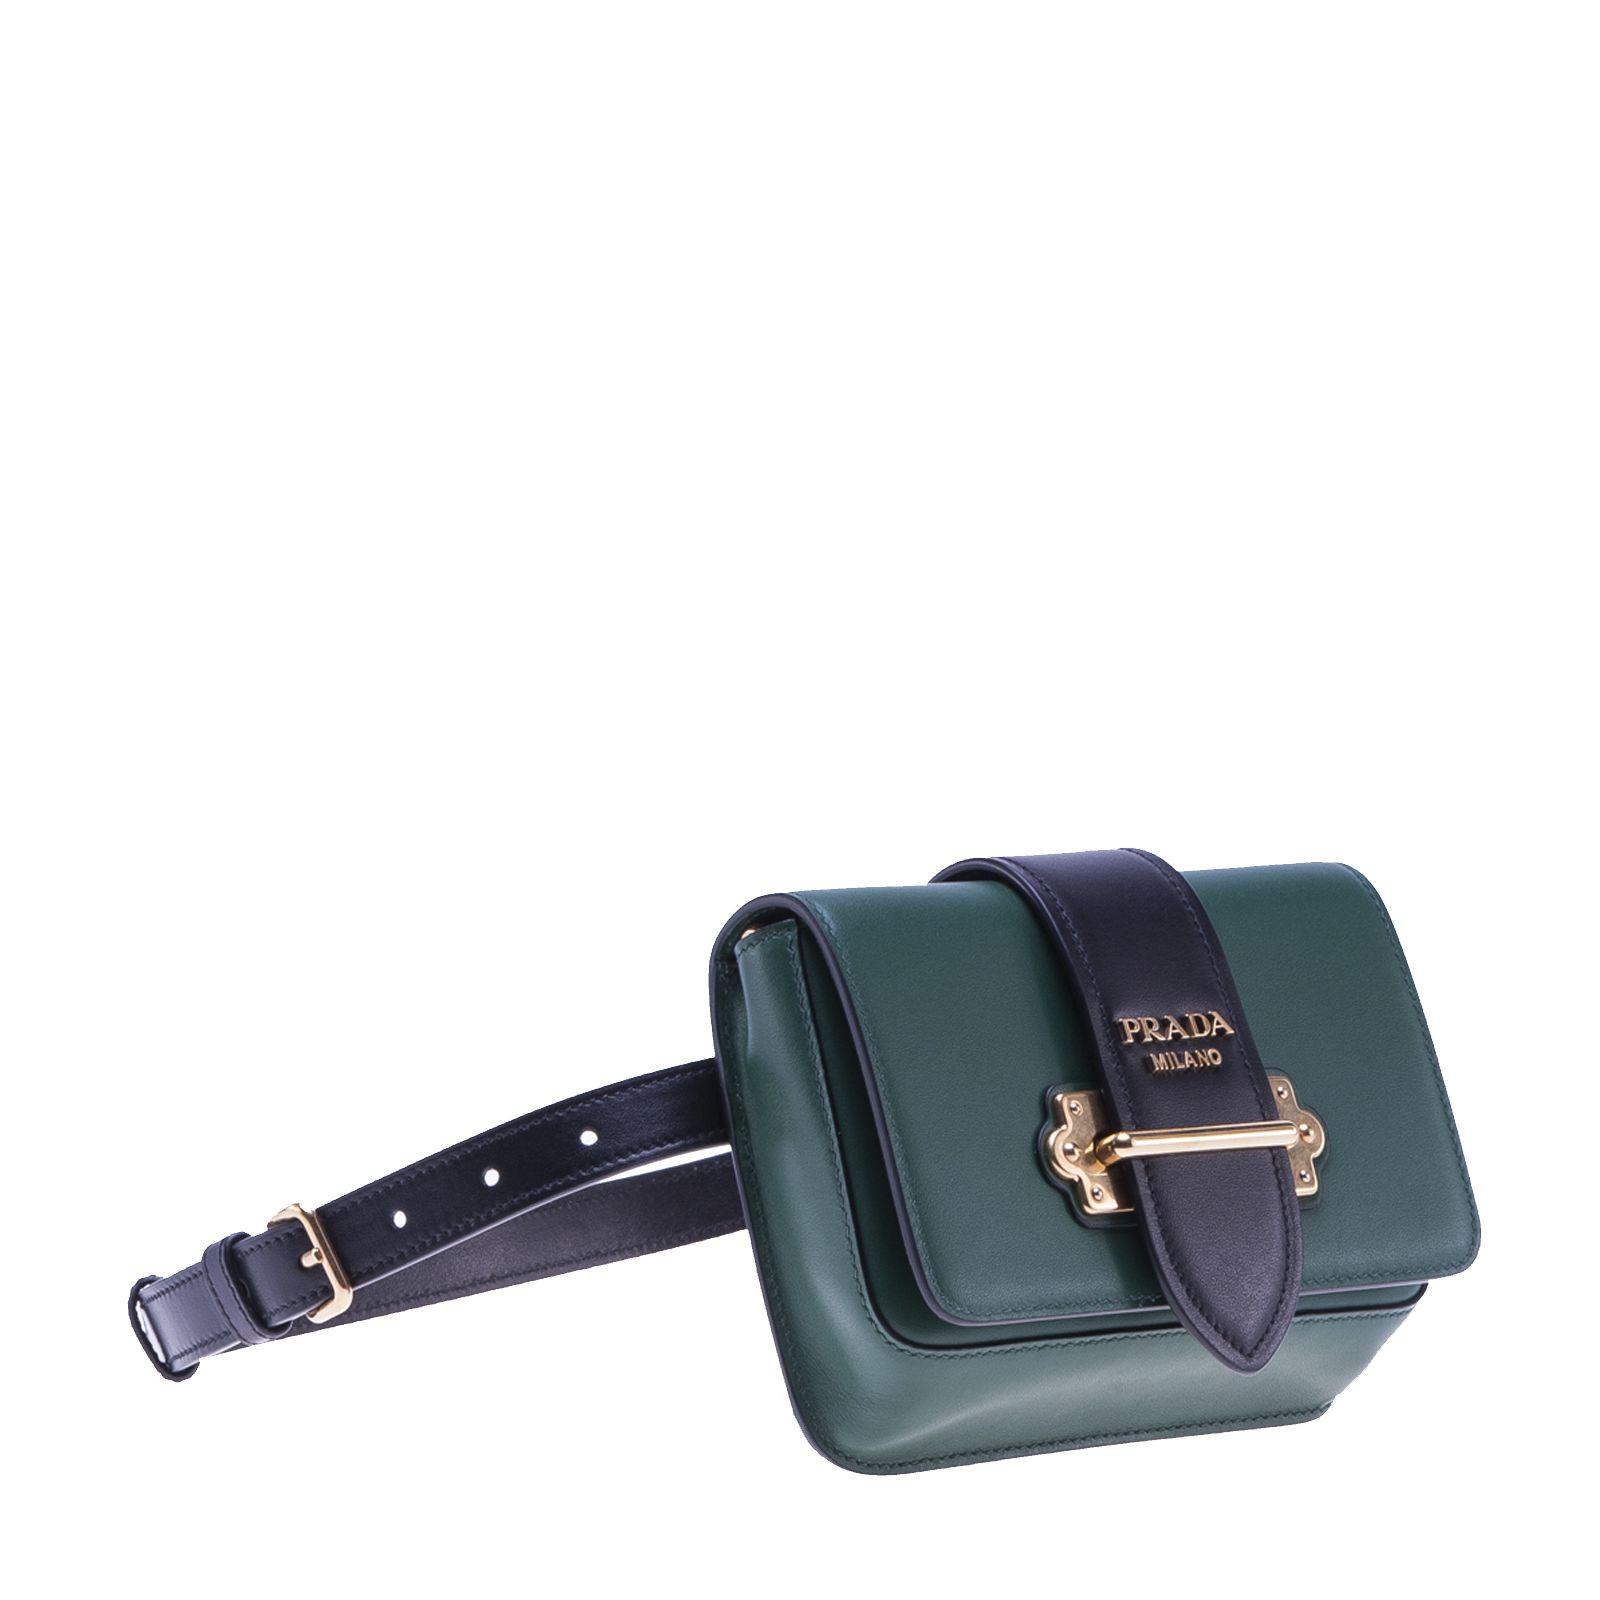 758c81571e9e Prada Cahier Convertible Belt Bag In Dark Green